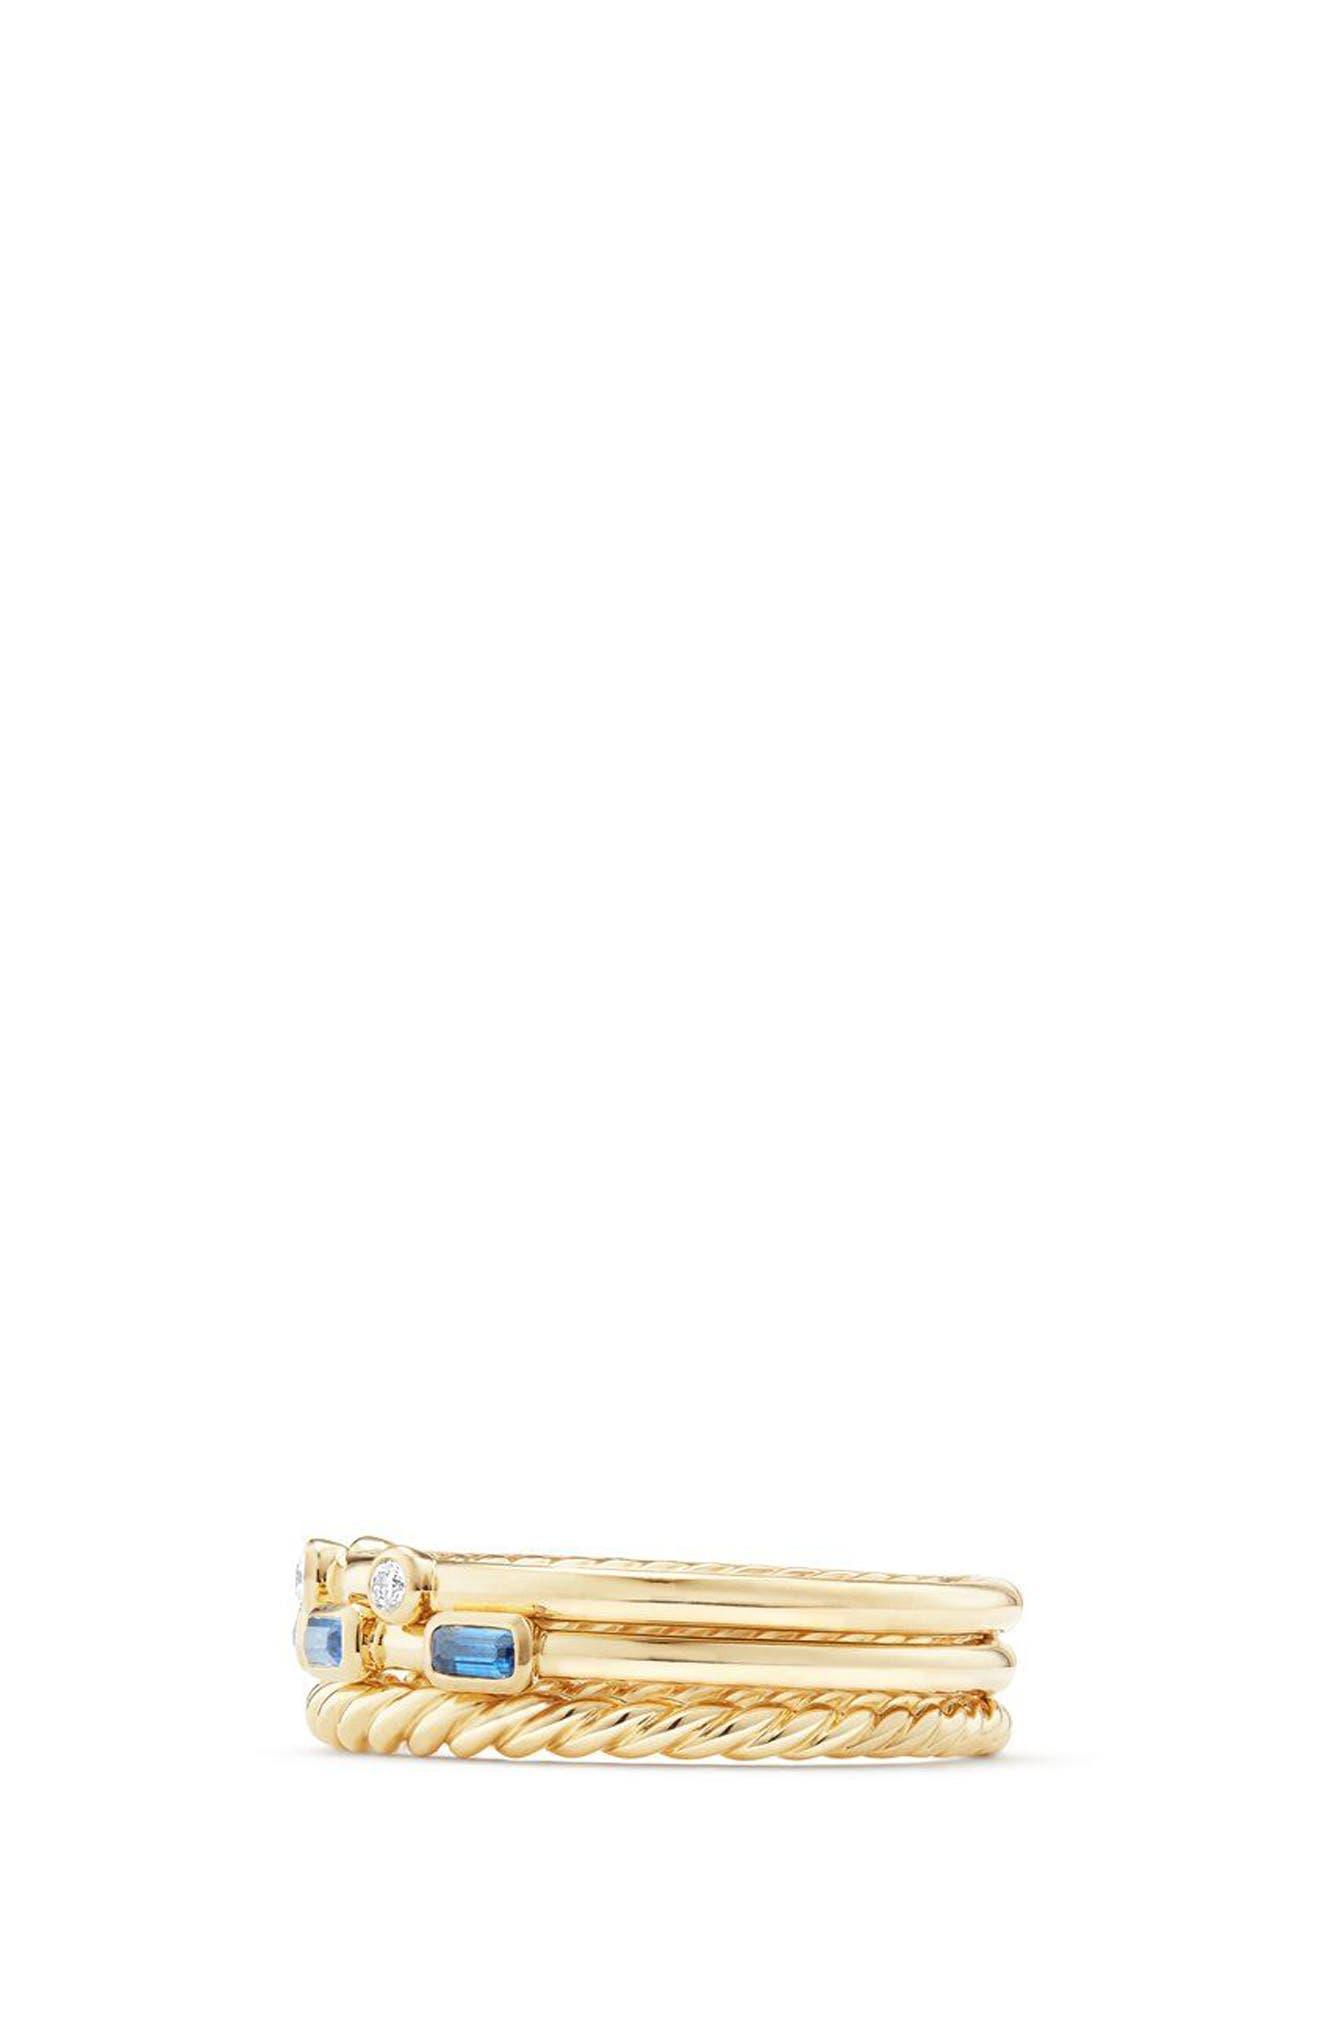 Novella 3-Row Ring with Diamonds,                             Alternate thumbnail 2, color,                             Gold/ Diamond/ Blue Sapphire